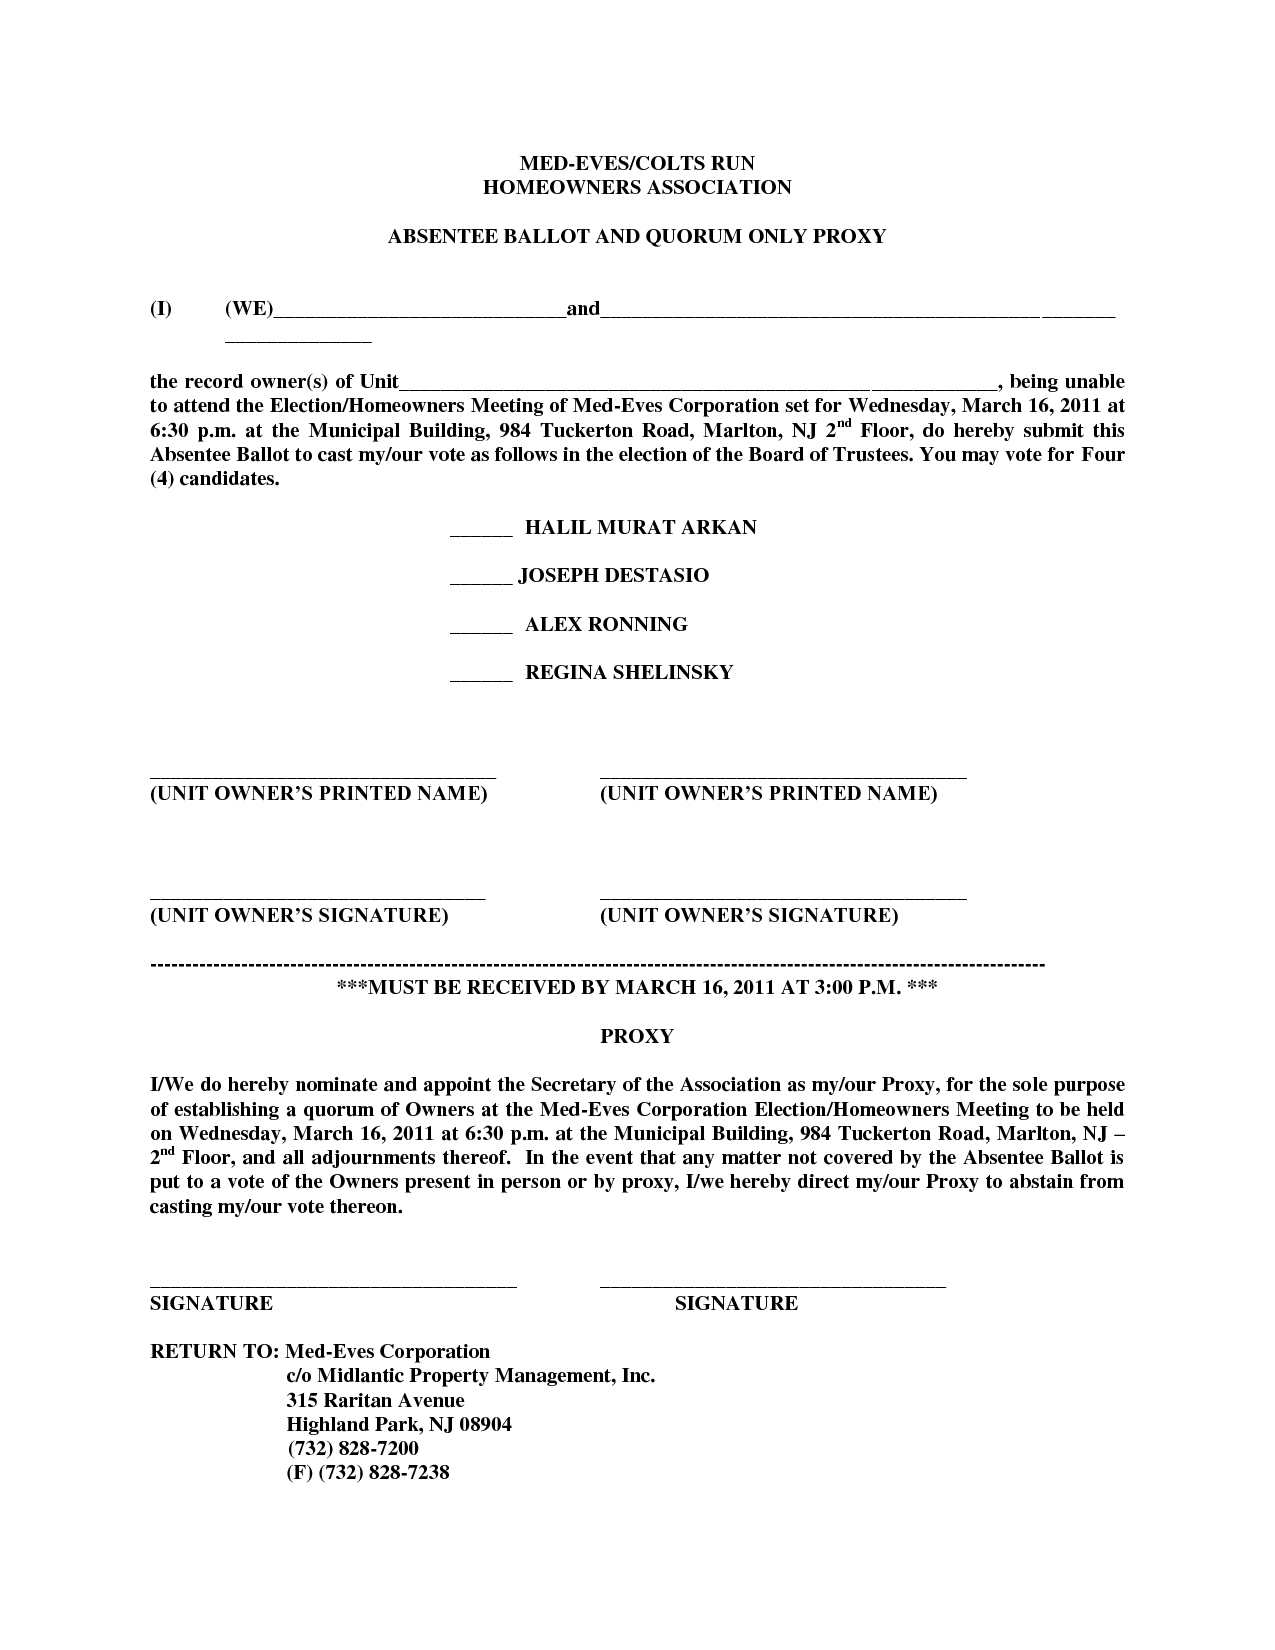 Hoa Proxy Form Template Free Printable Documents